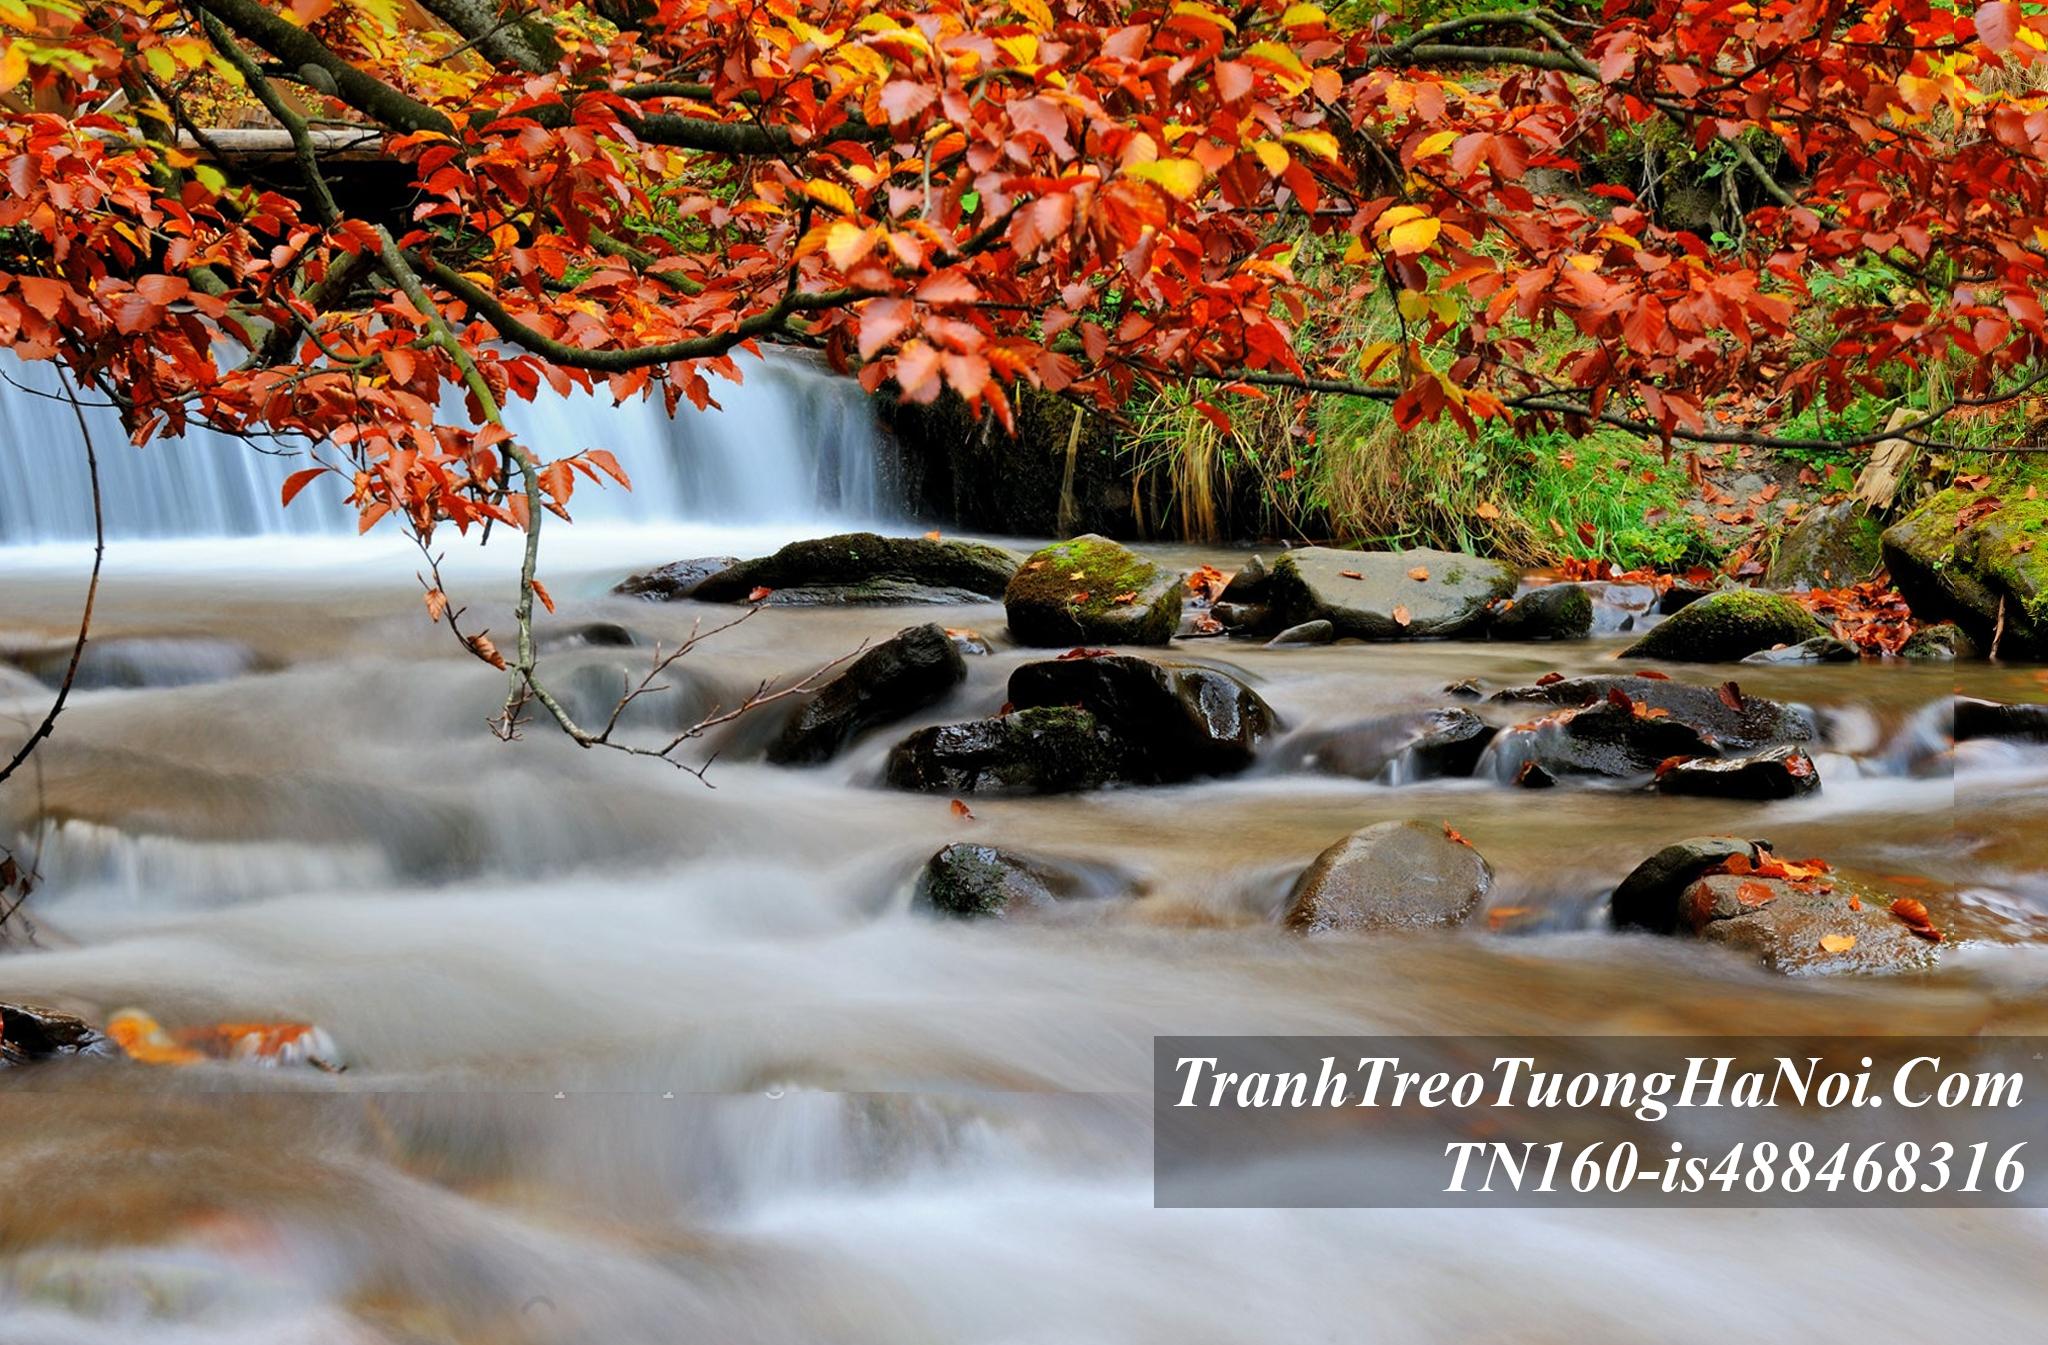 Tranh dong thac nuoc thu cuc dep amia TN160-is488468316